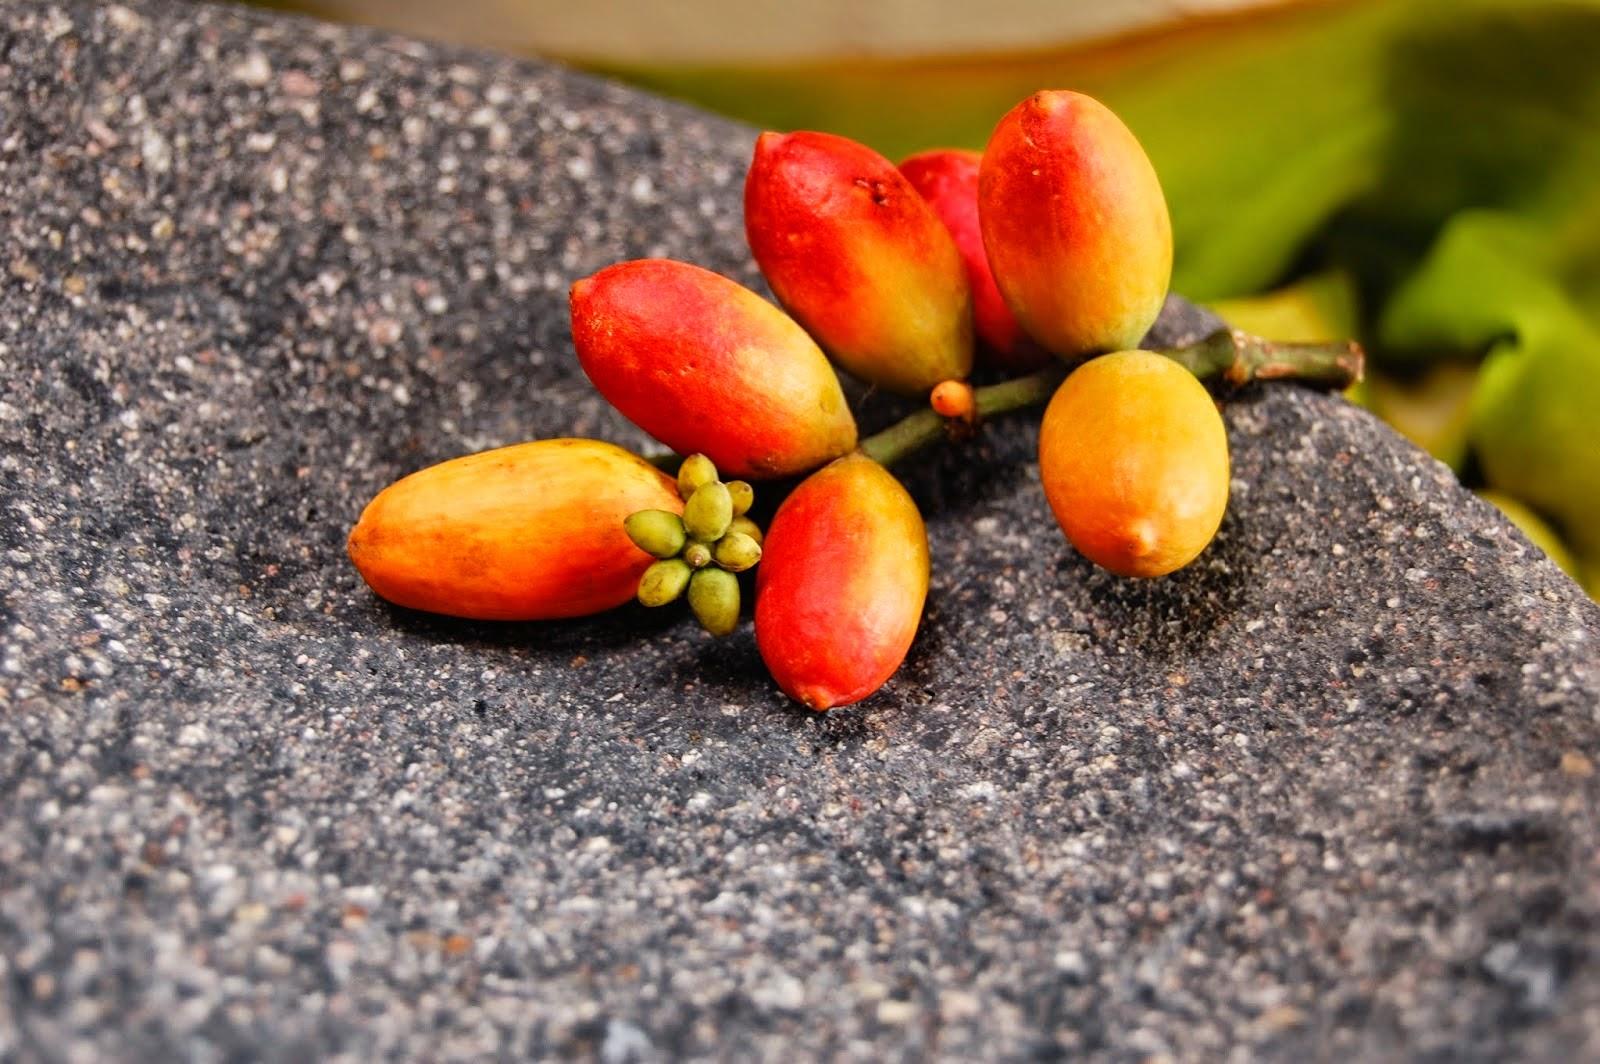 Health Benefits of Melinjo Leaves and Melinjo Seeds